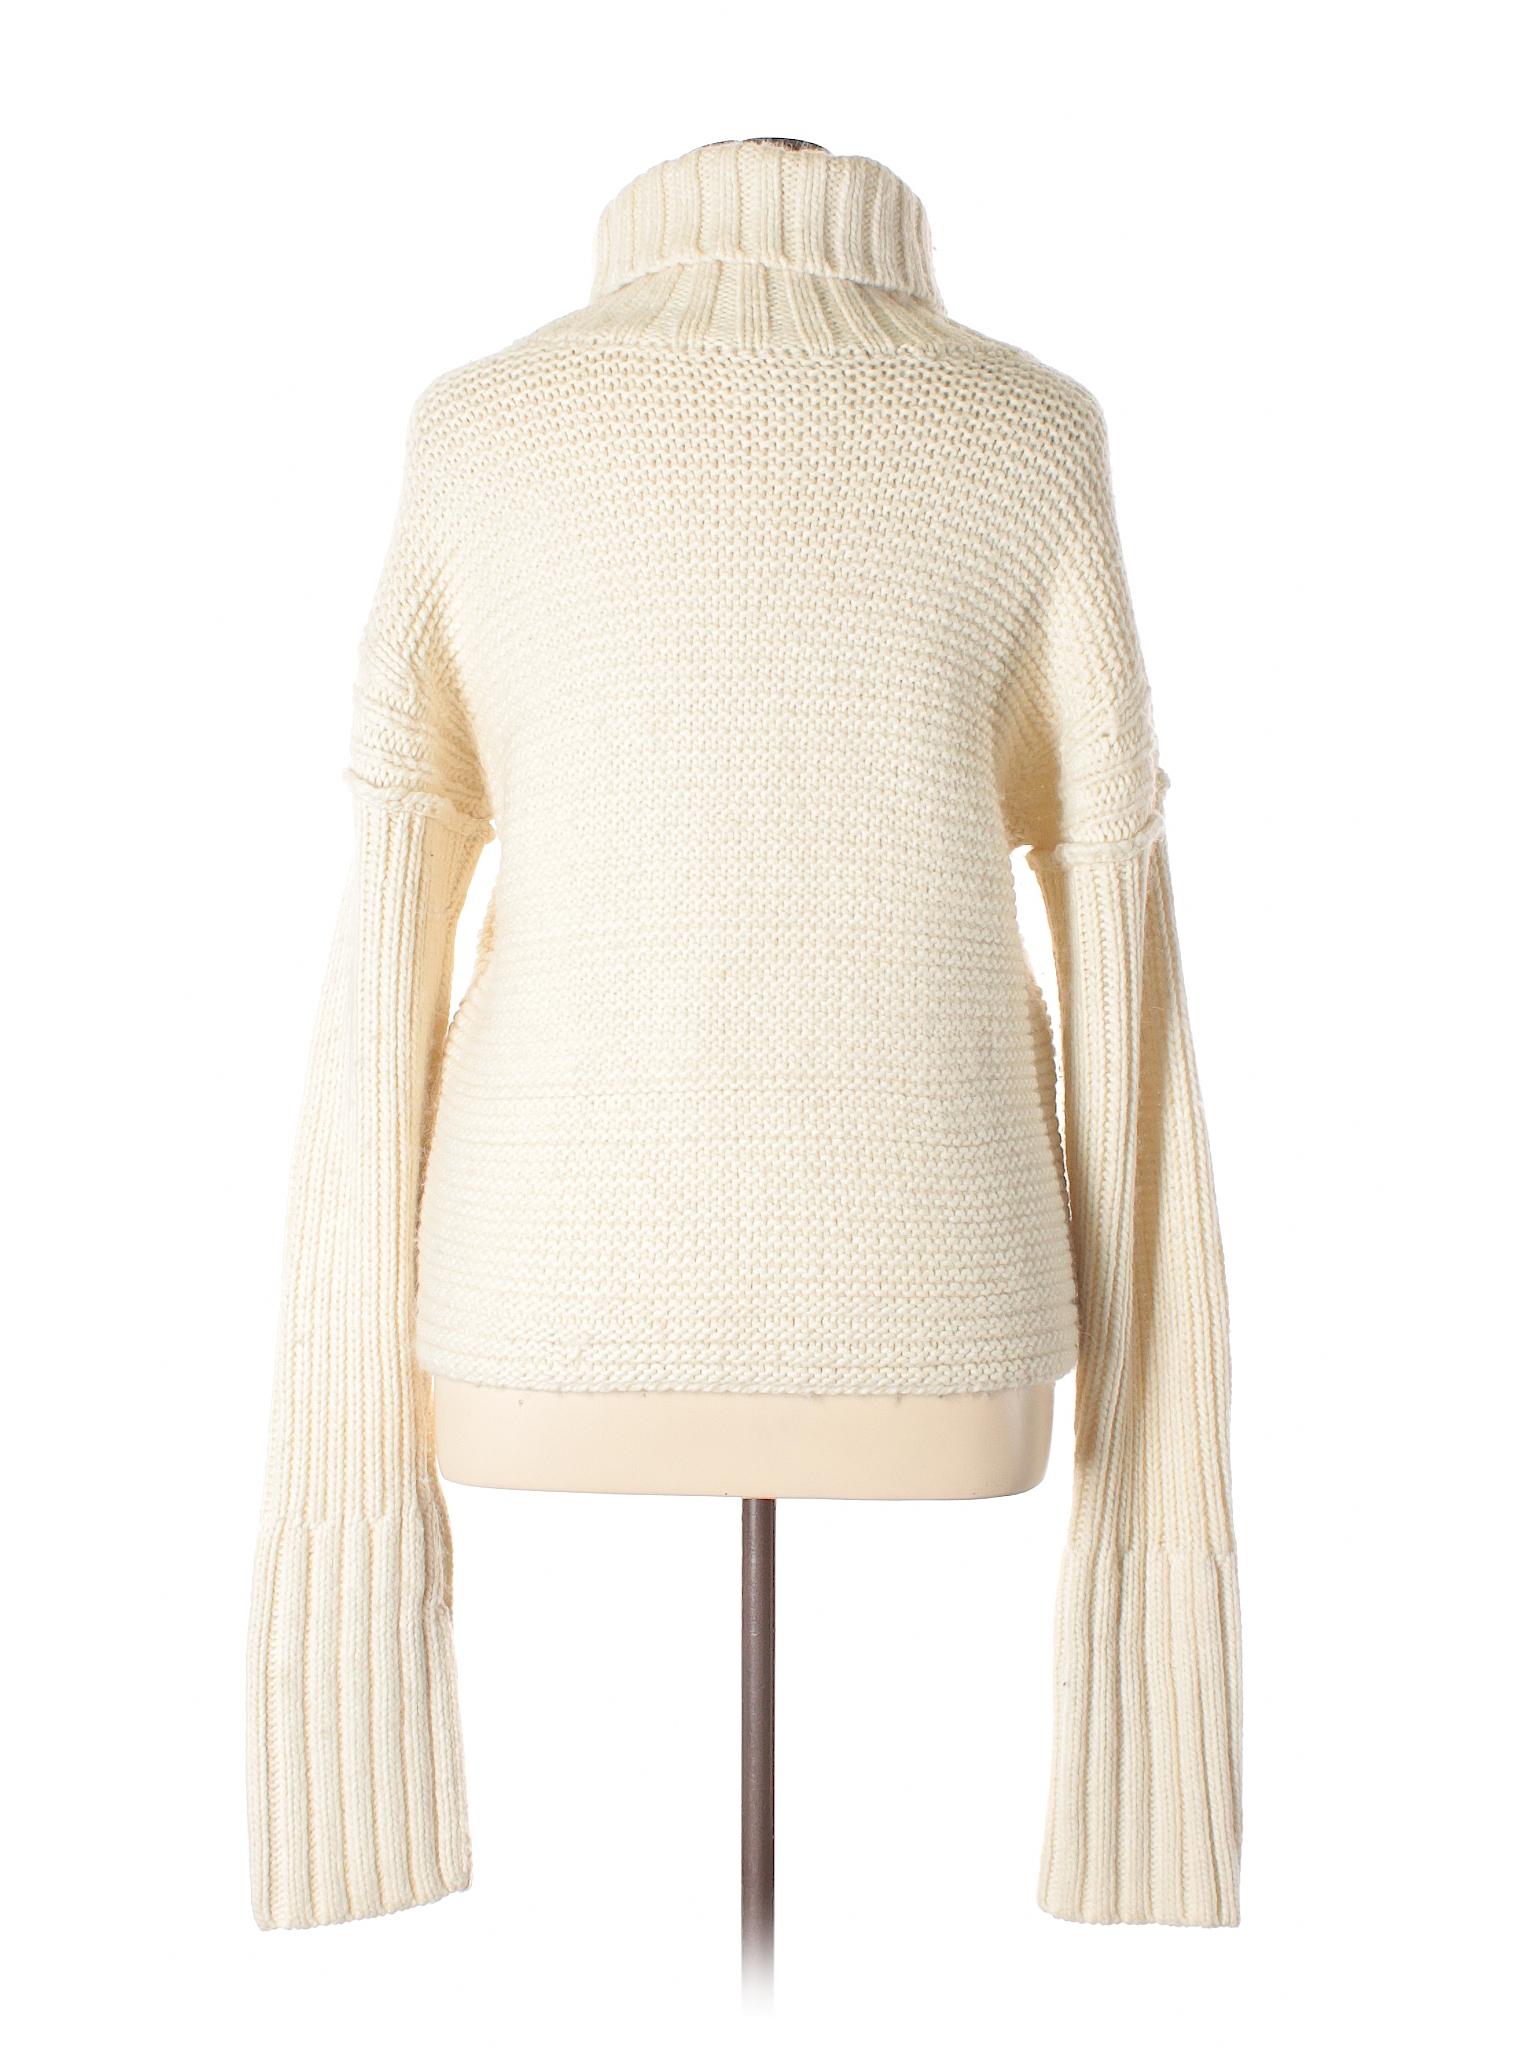 Apart winter Boutique Apiece Sweater Turtleneck 1xTHgnWH